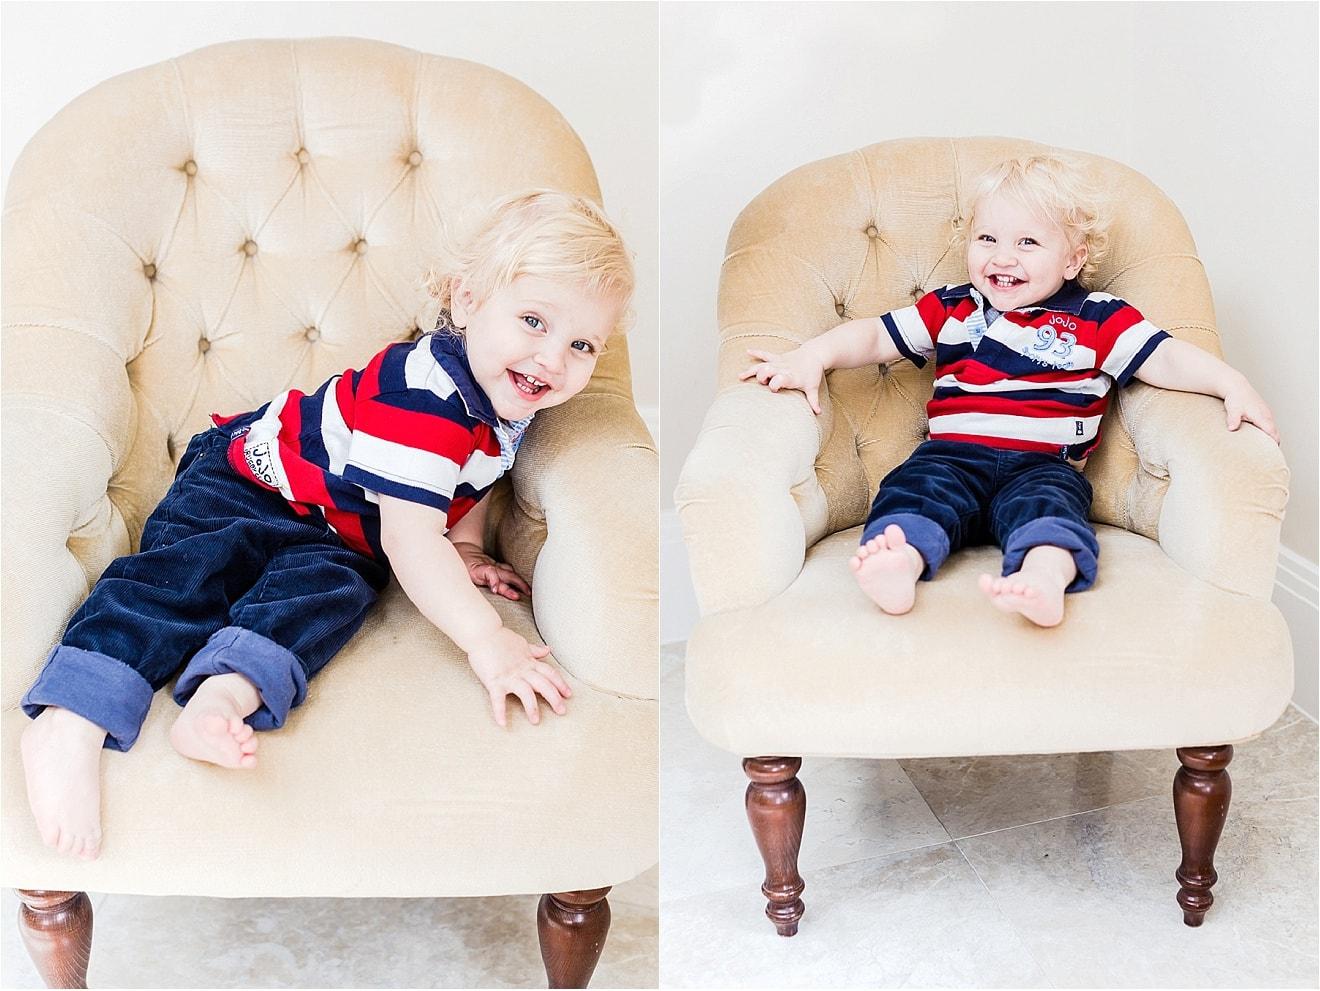 Eddie-Judd-Family-Portrait-Photography020